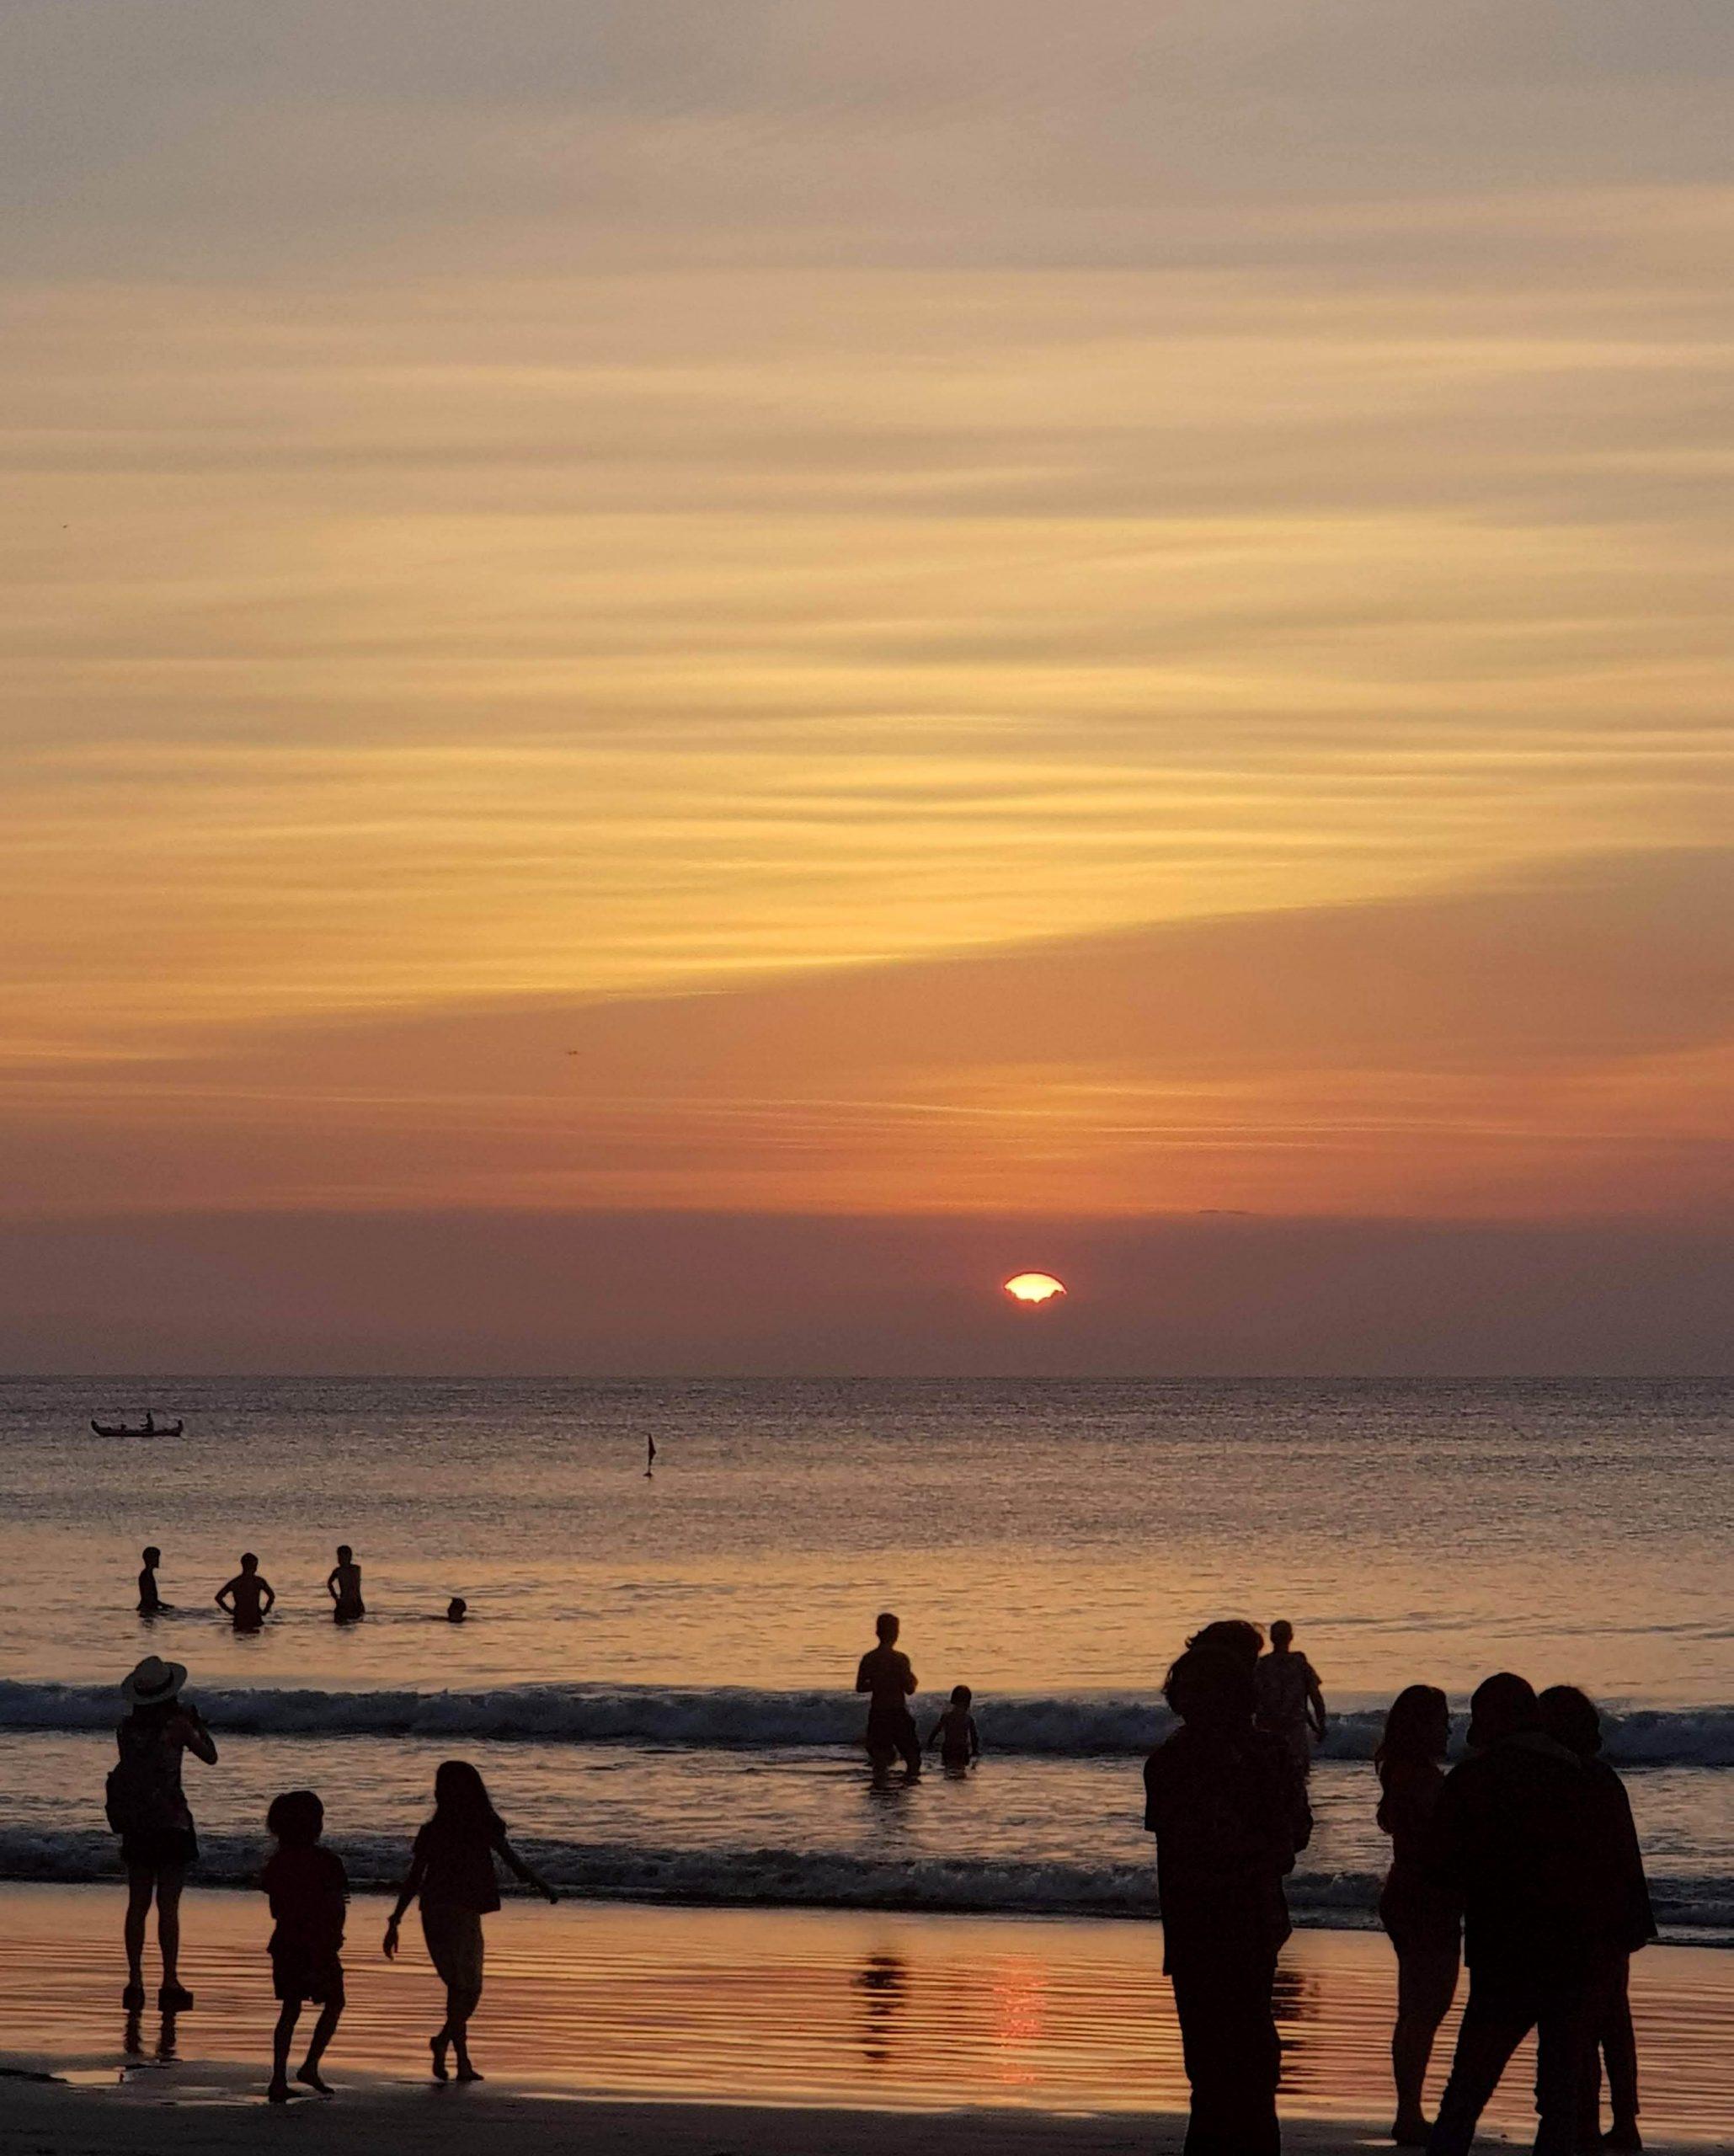 travel light up life business blogger bali sunset beach culture